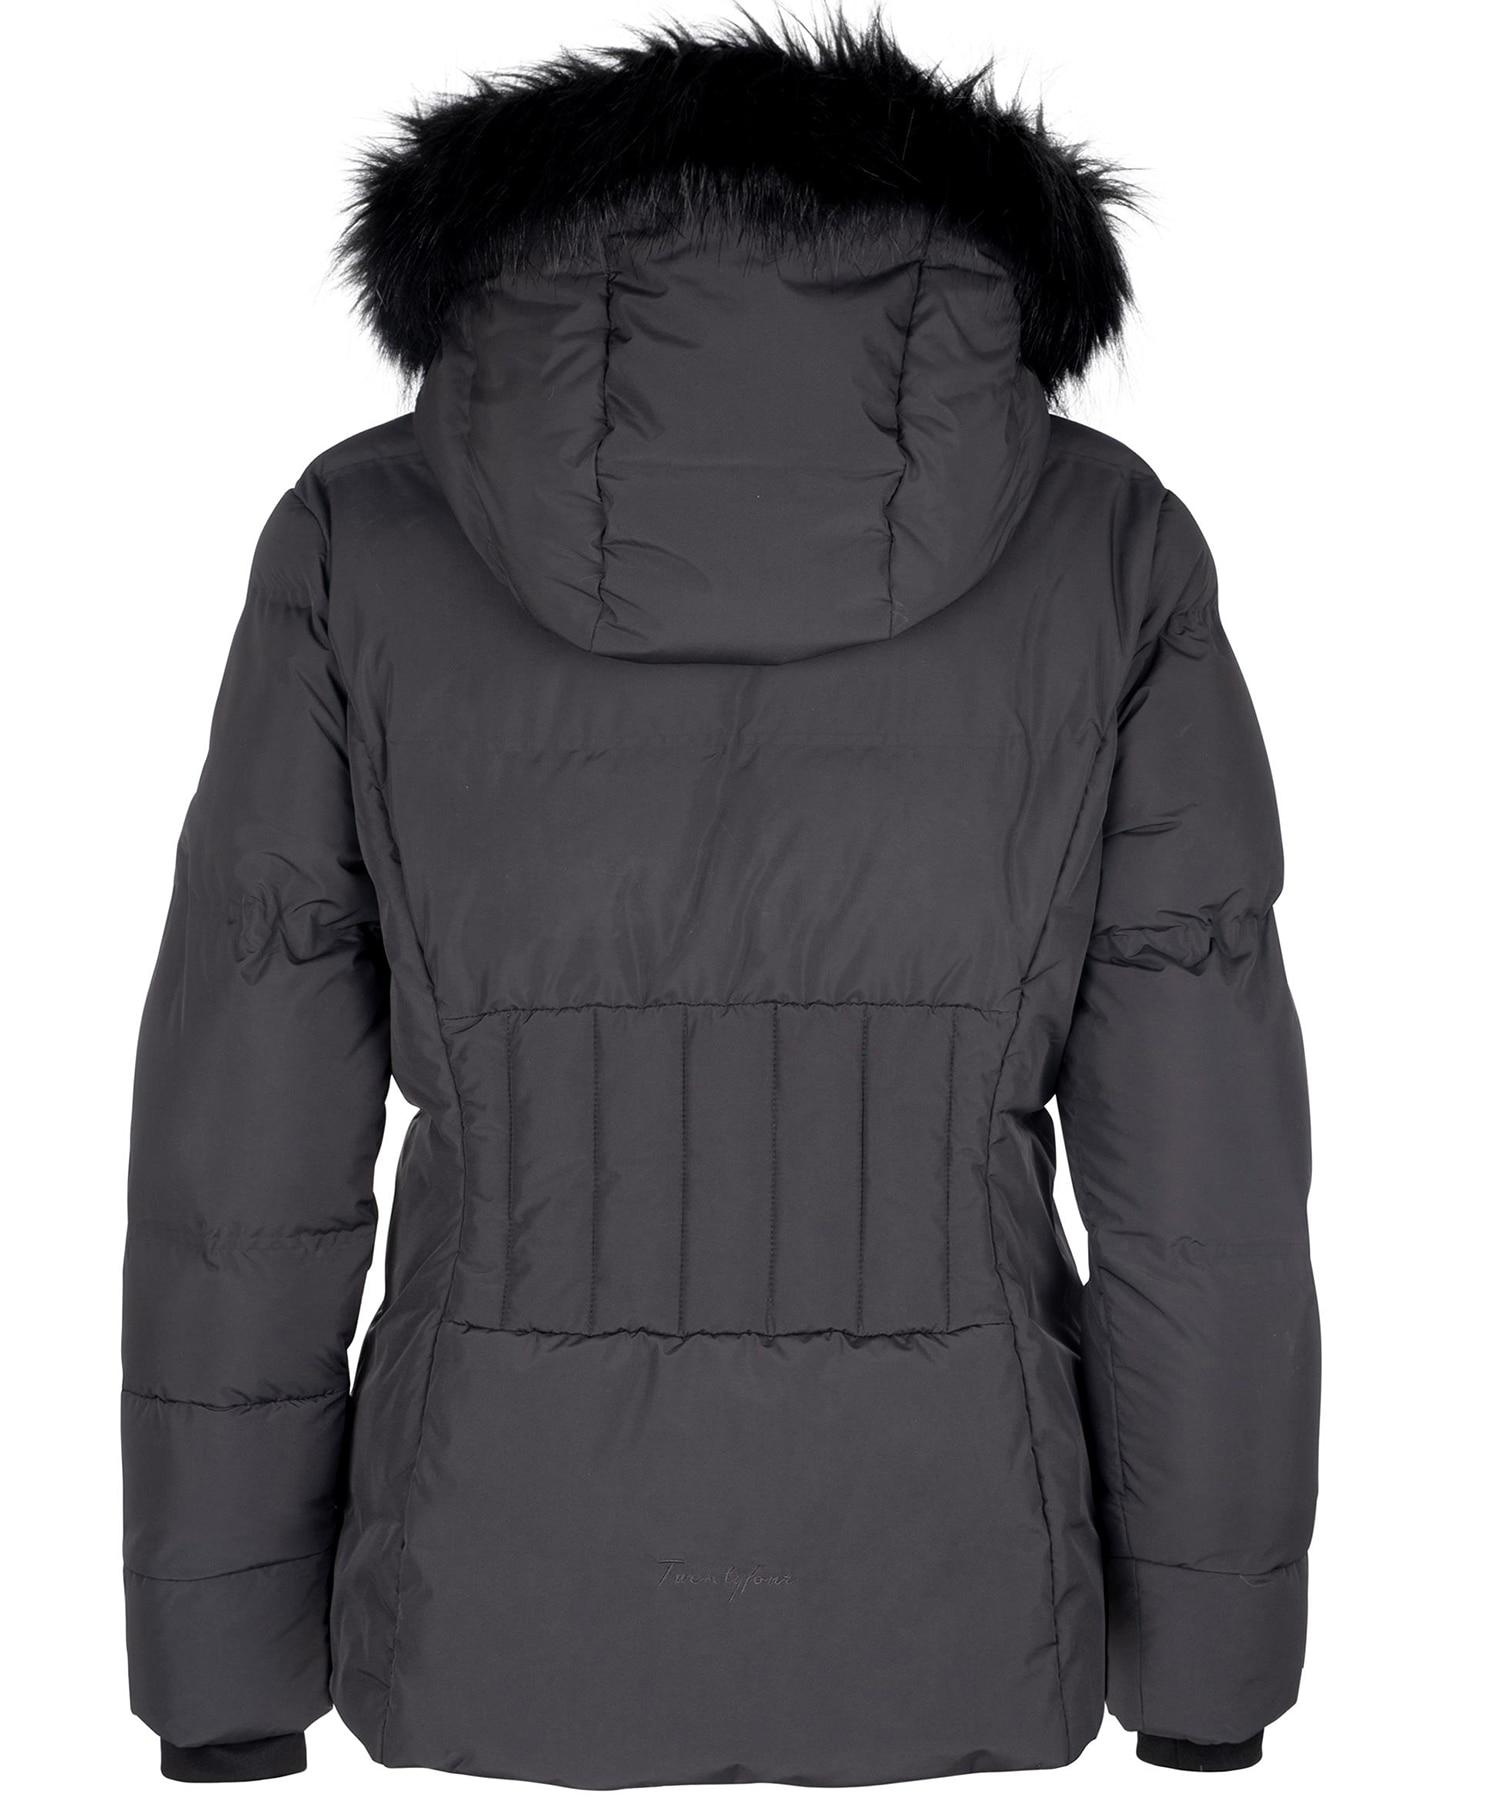 Twentyfour Meribel Jacket